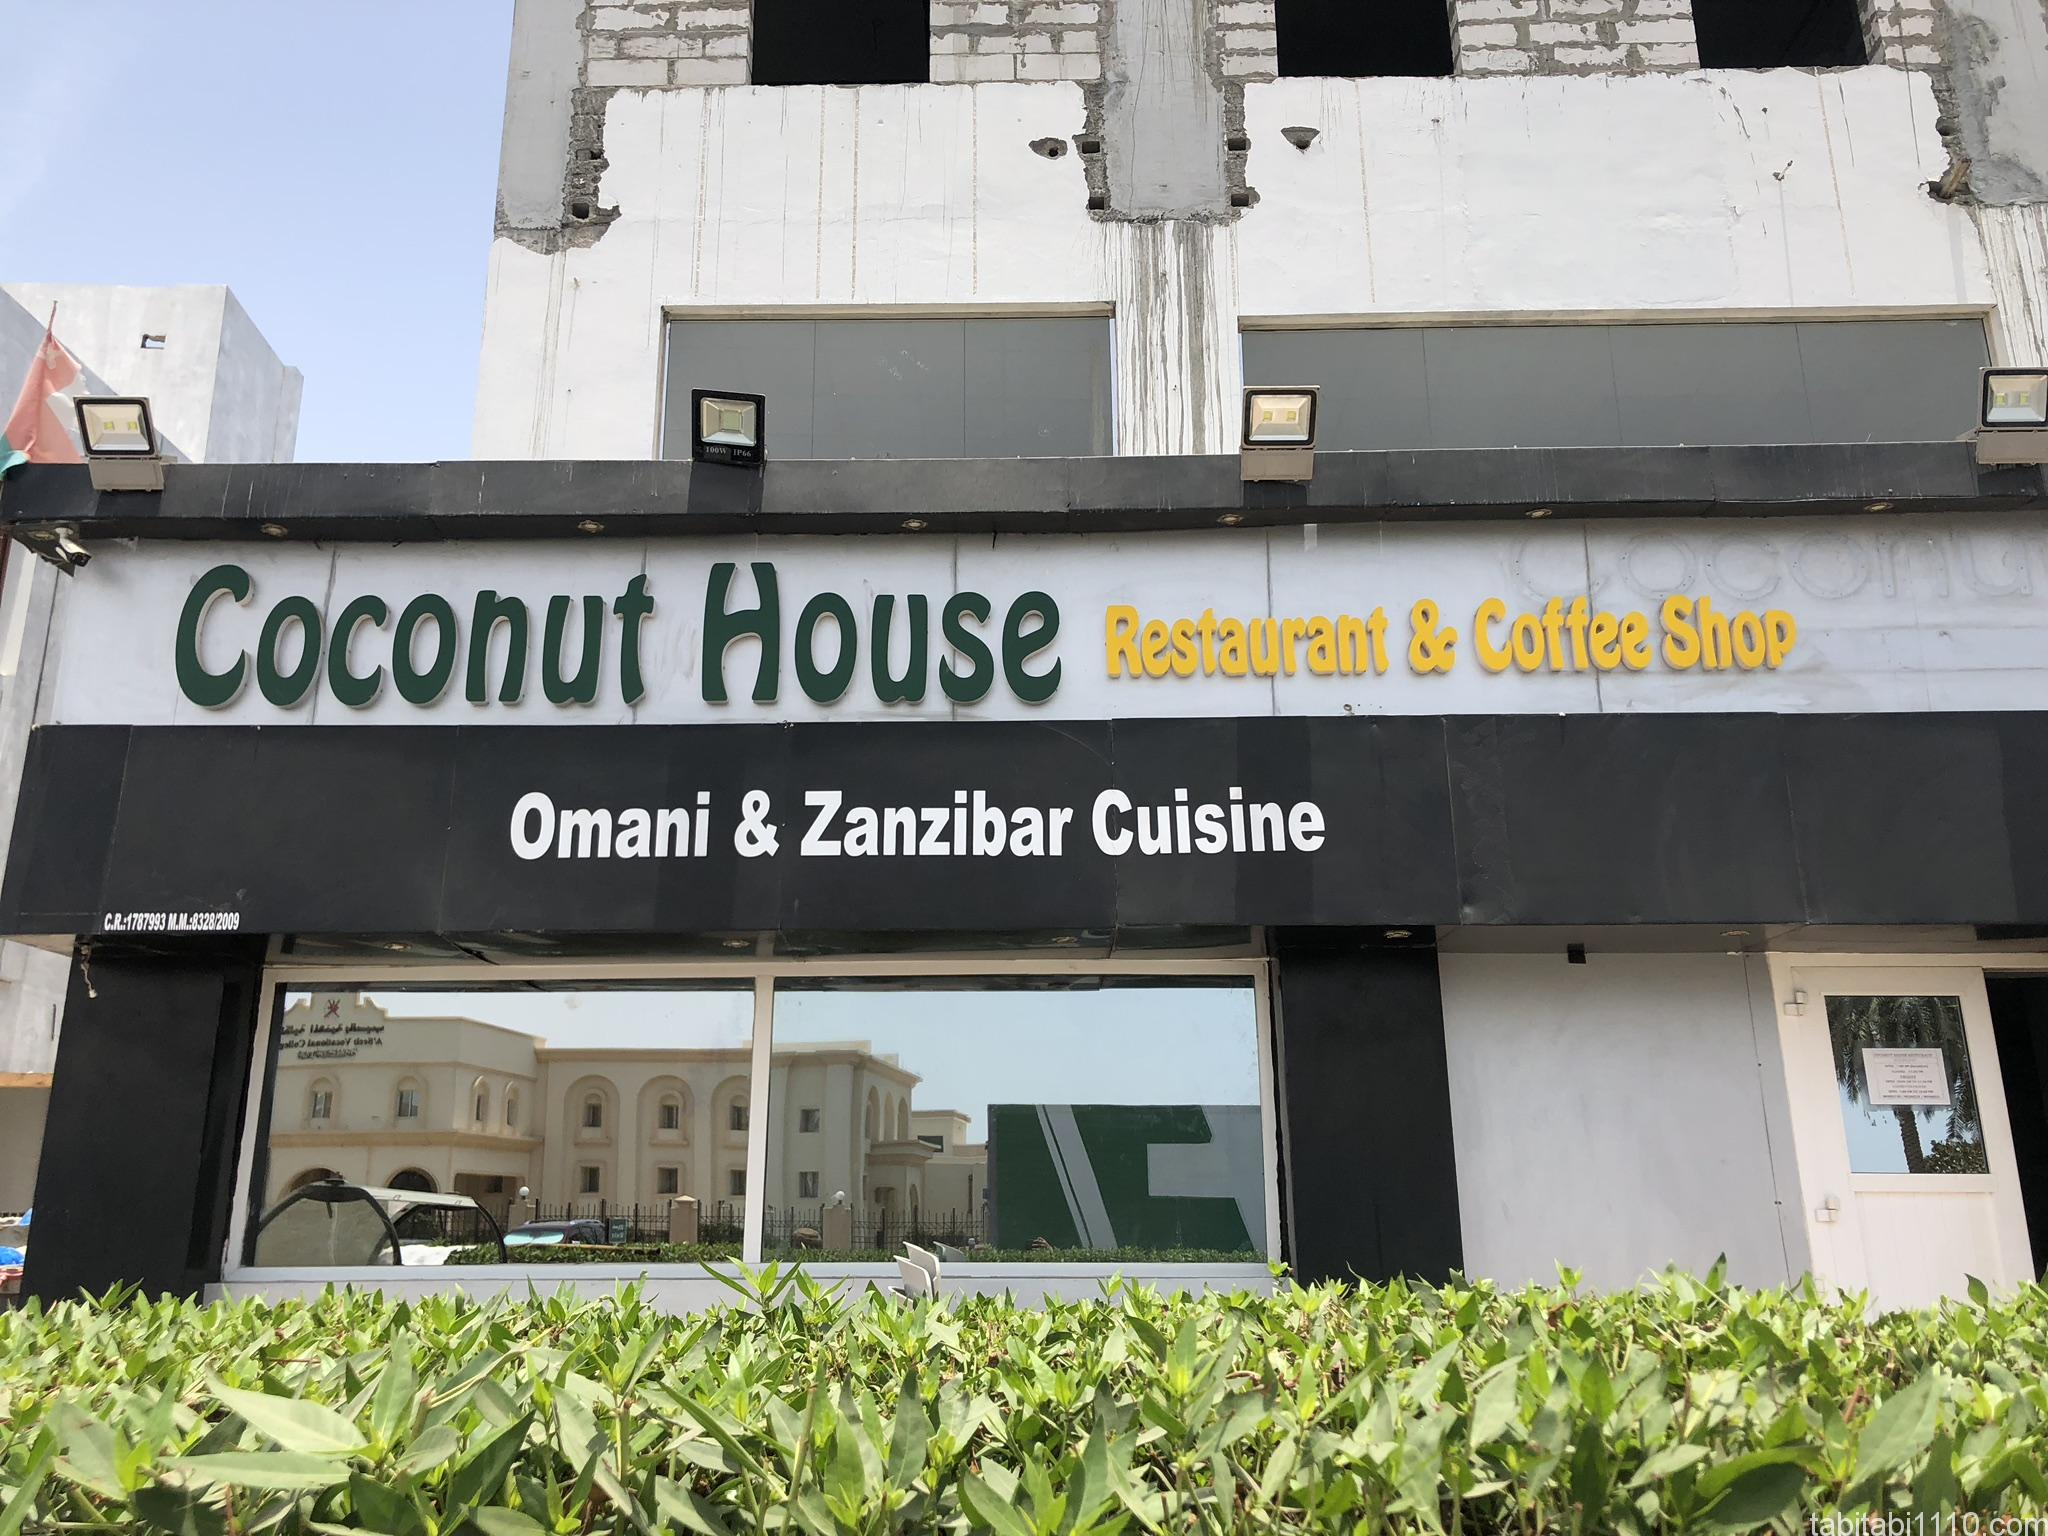 Coconut House Restaurant